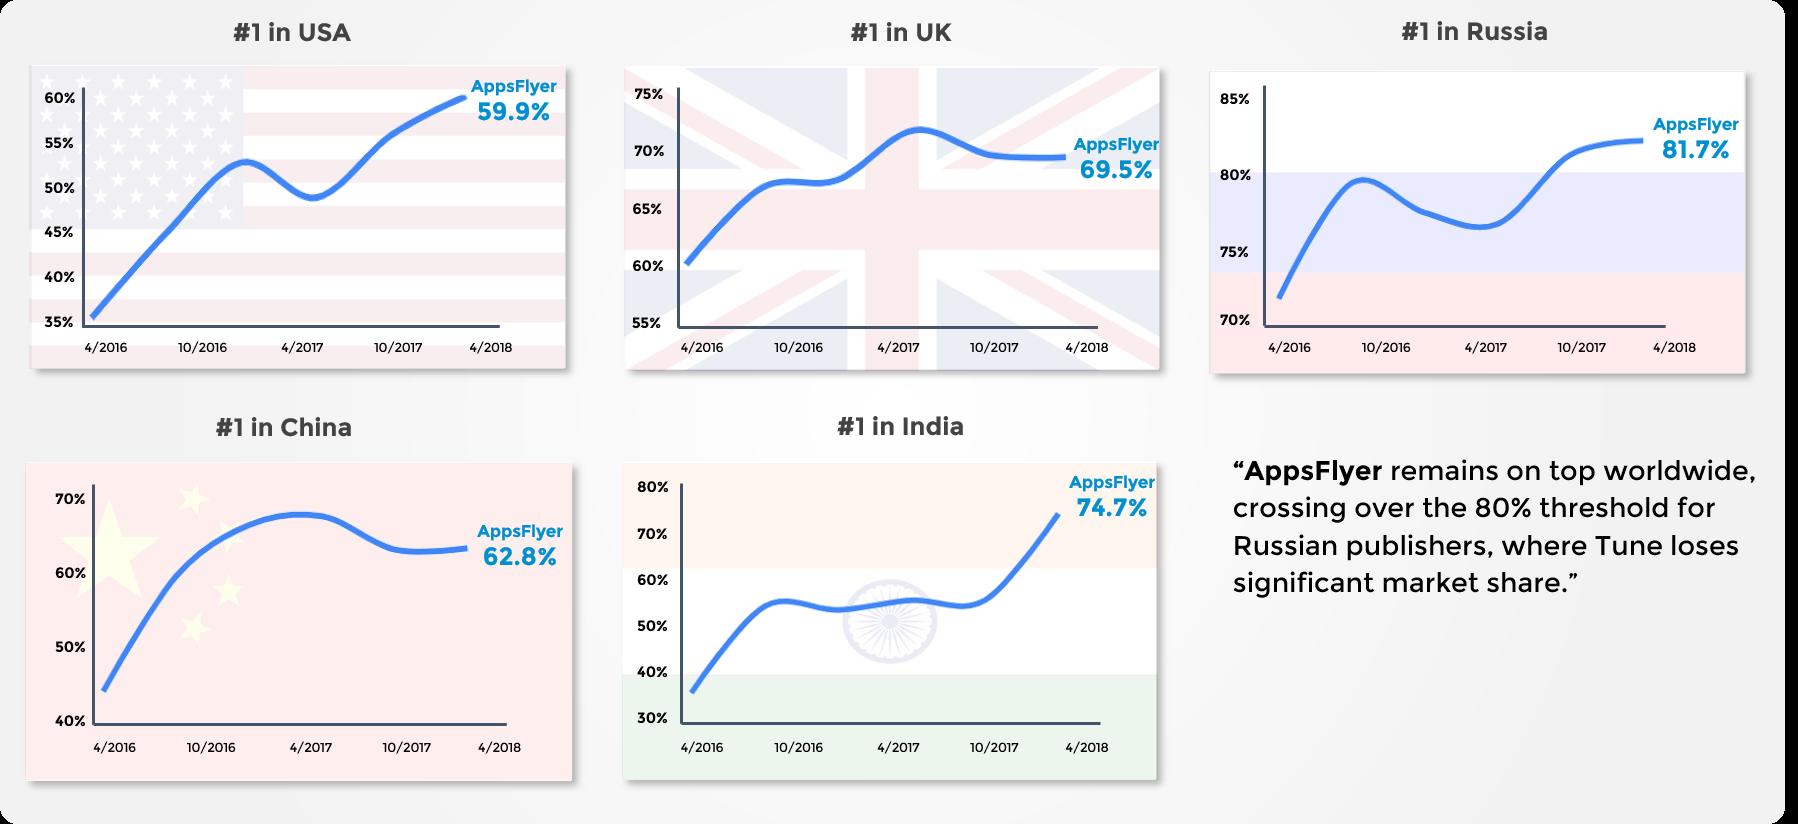 AppsFlyer Regional Market Share